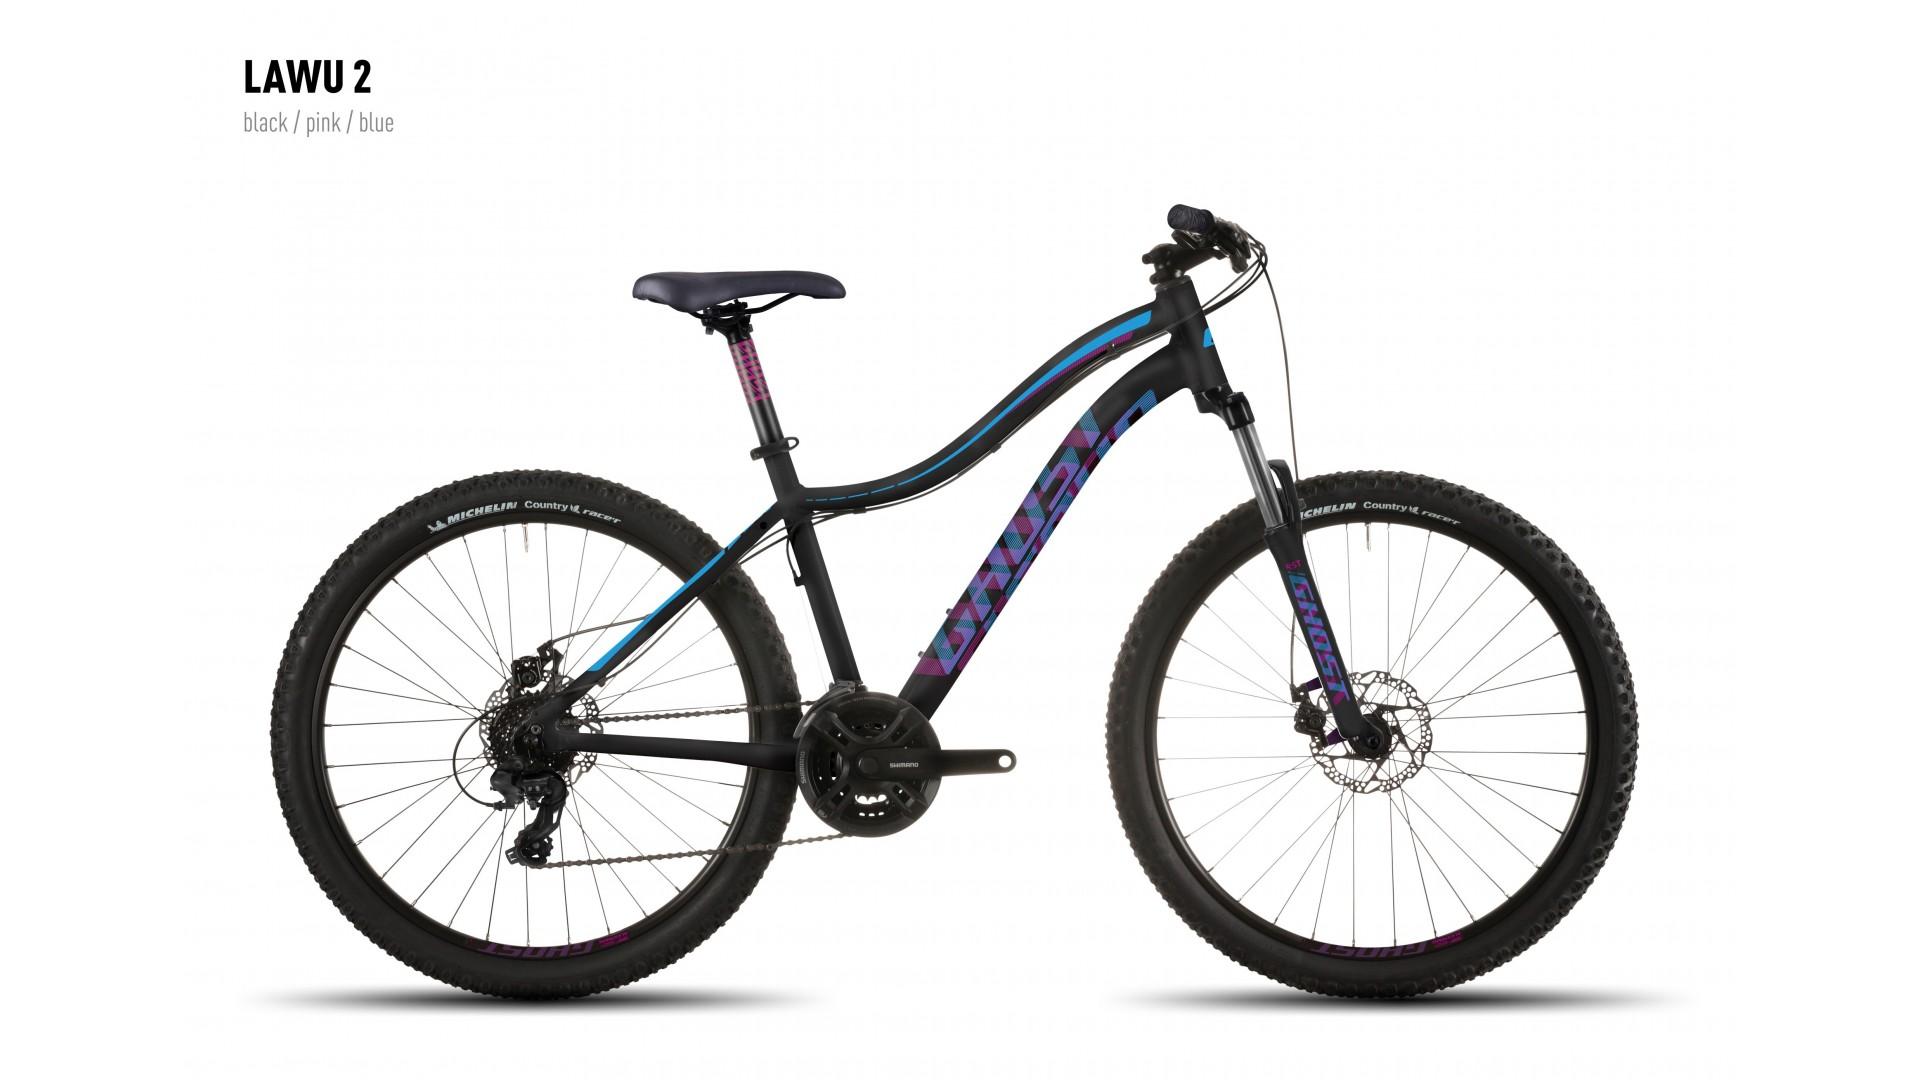 Велосипед GHOST Lawu 2 black/pink/blue год 2016